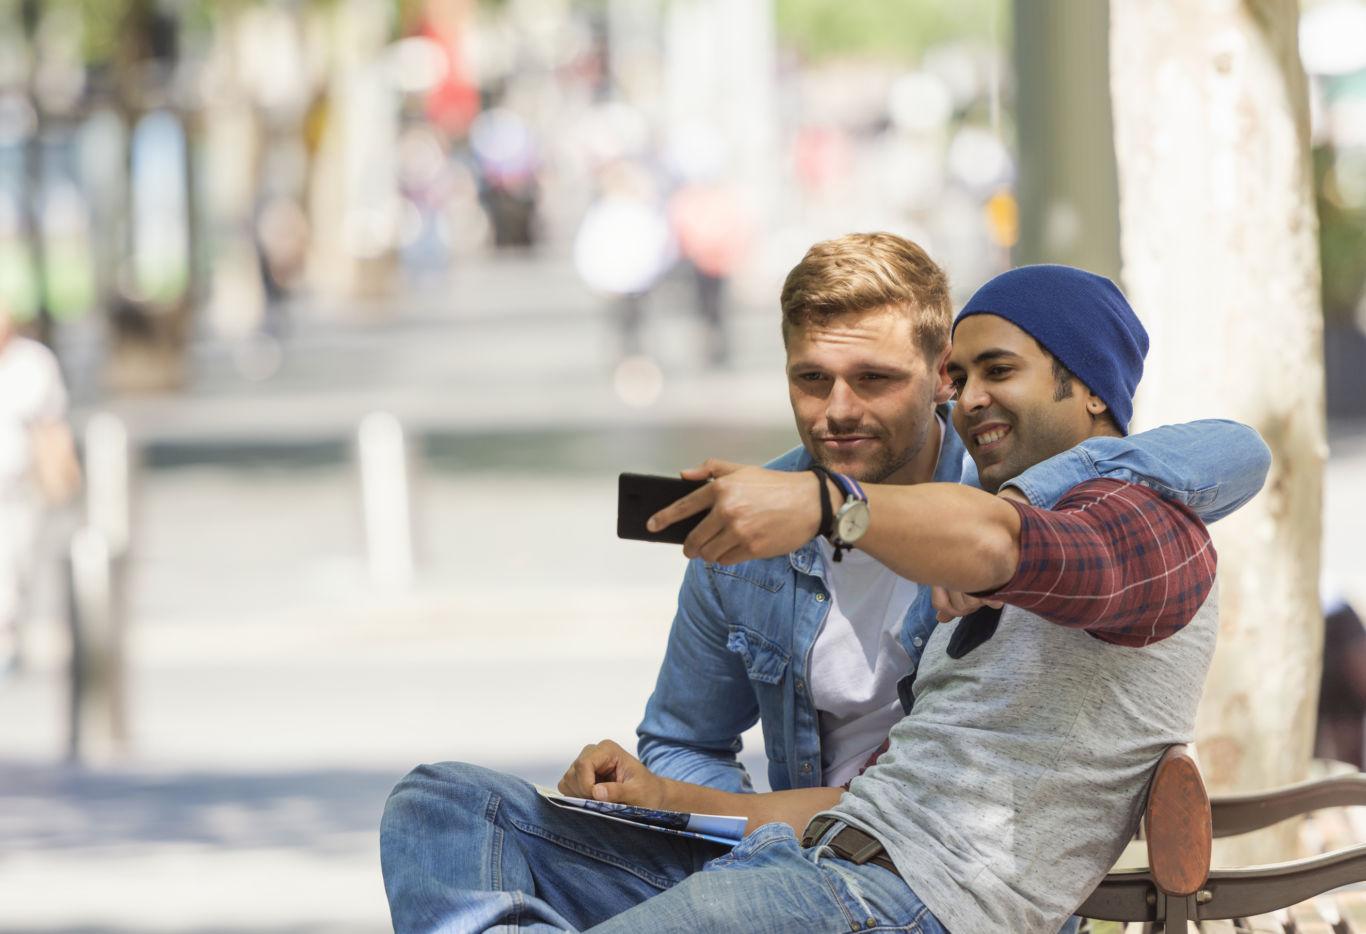 Friends Holding Phone | Nine15 Midtown